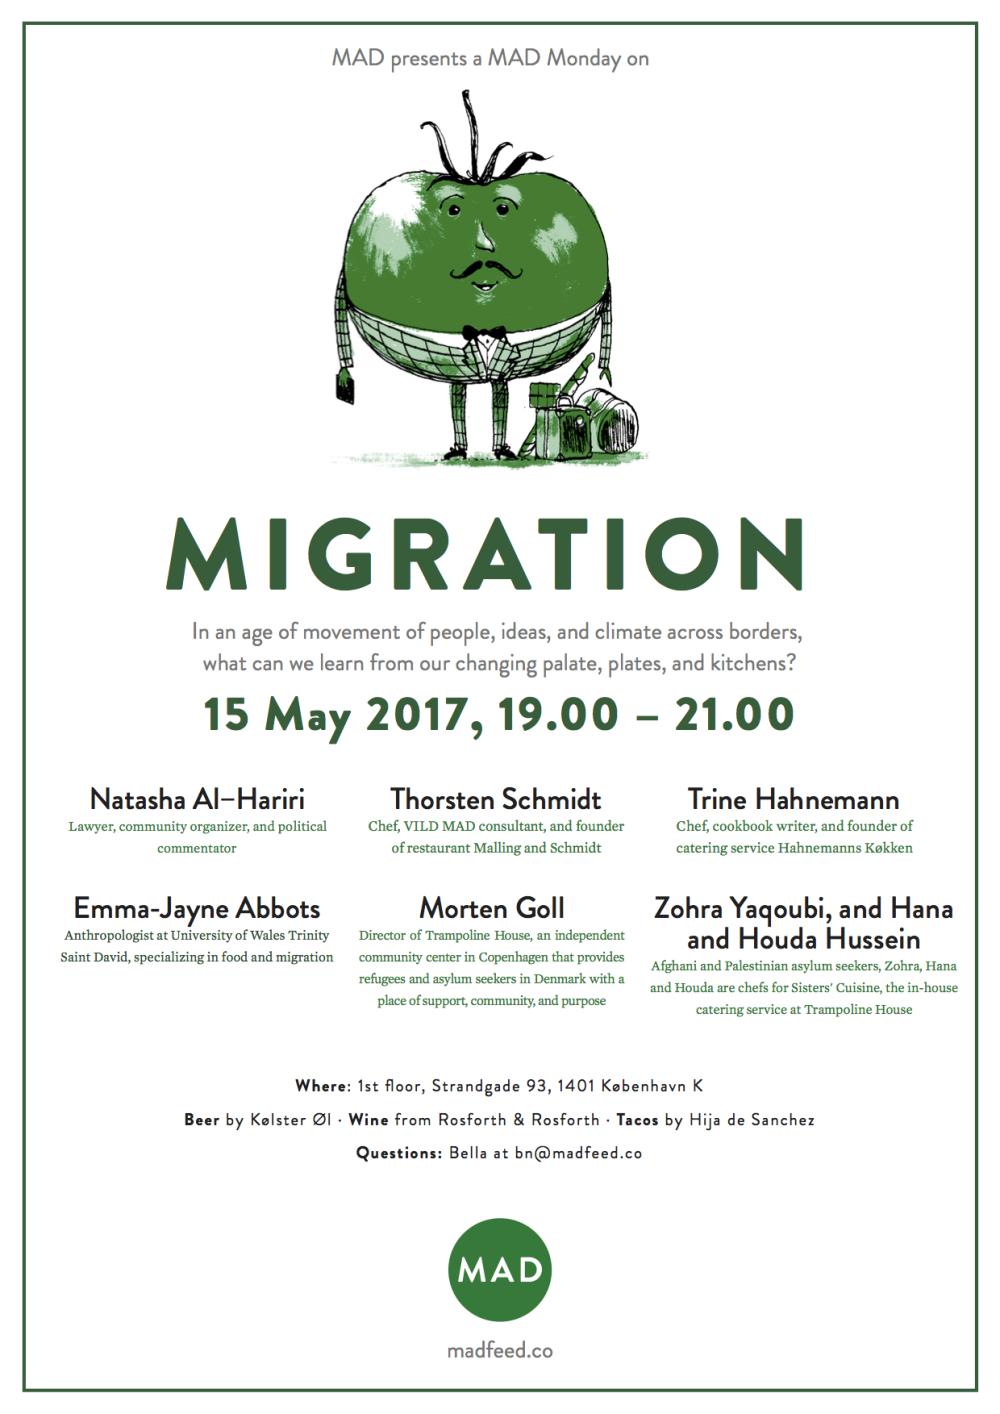 2017-05-10MigrationFlyer